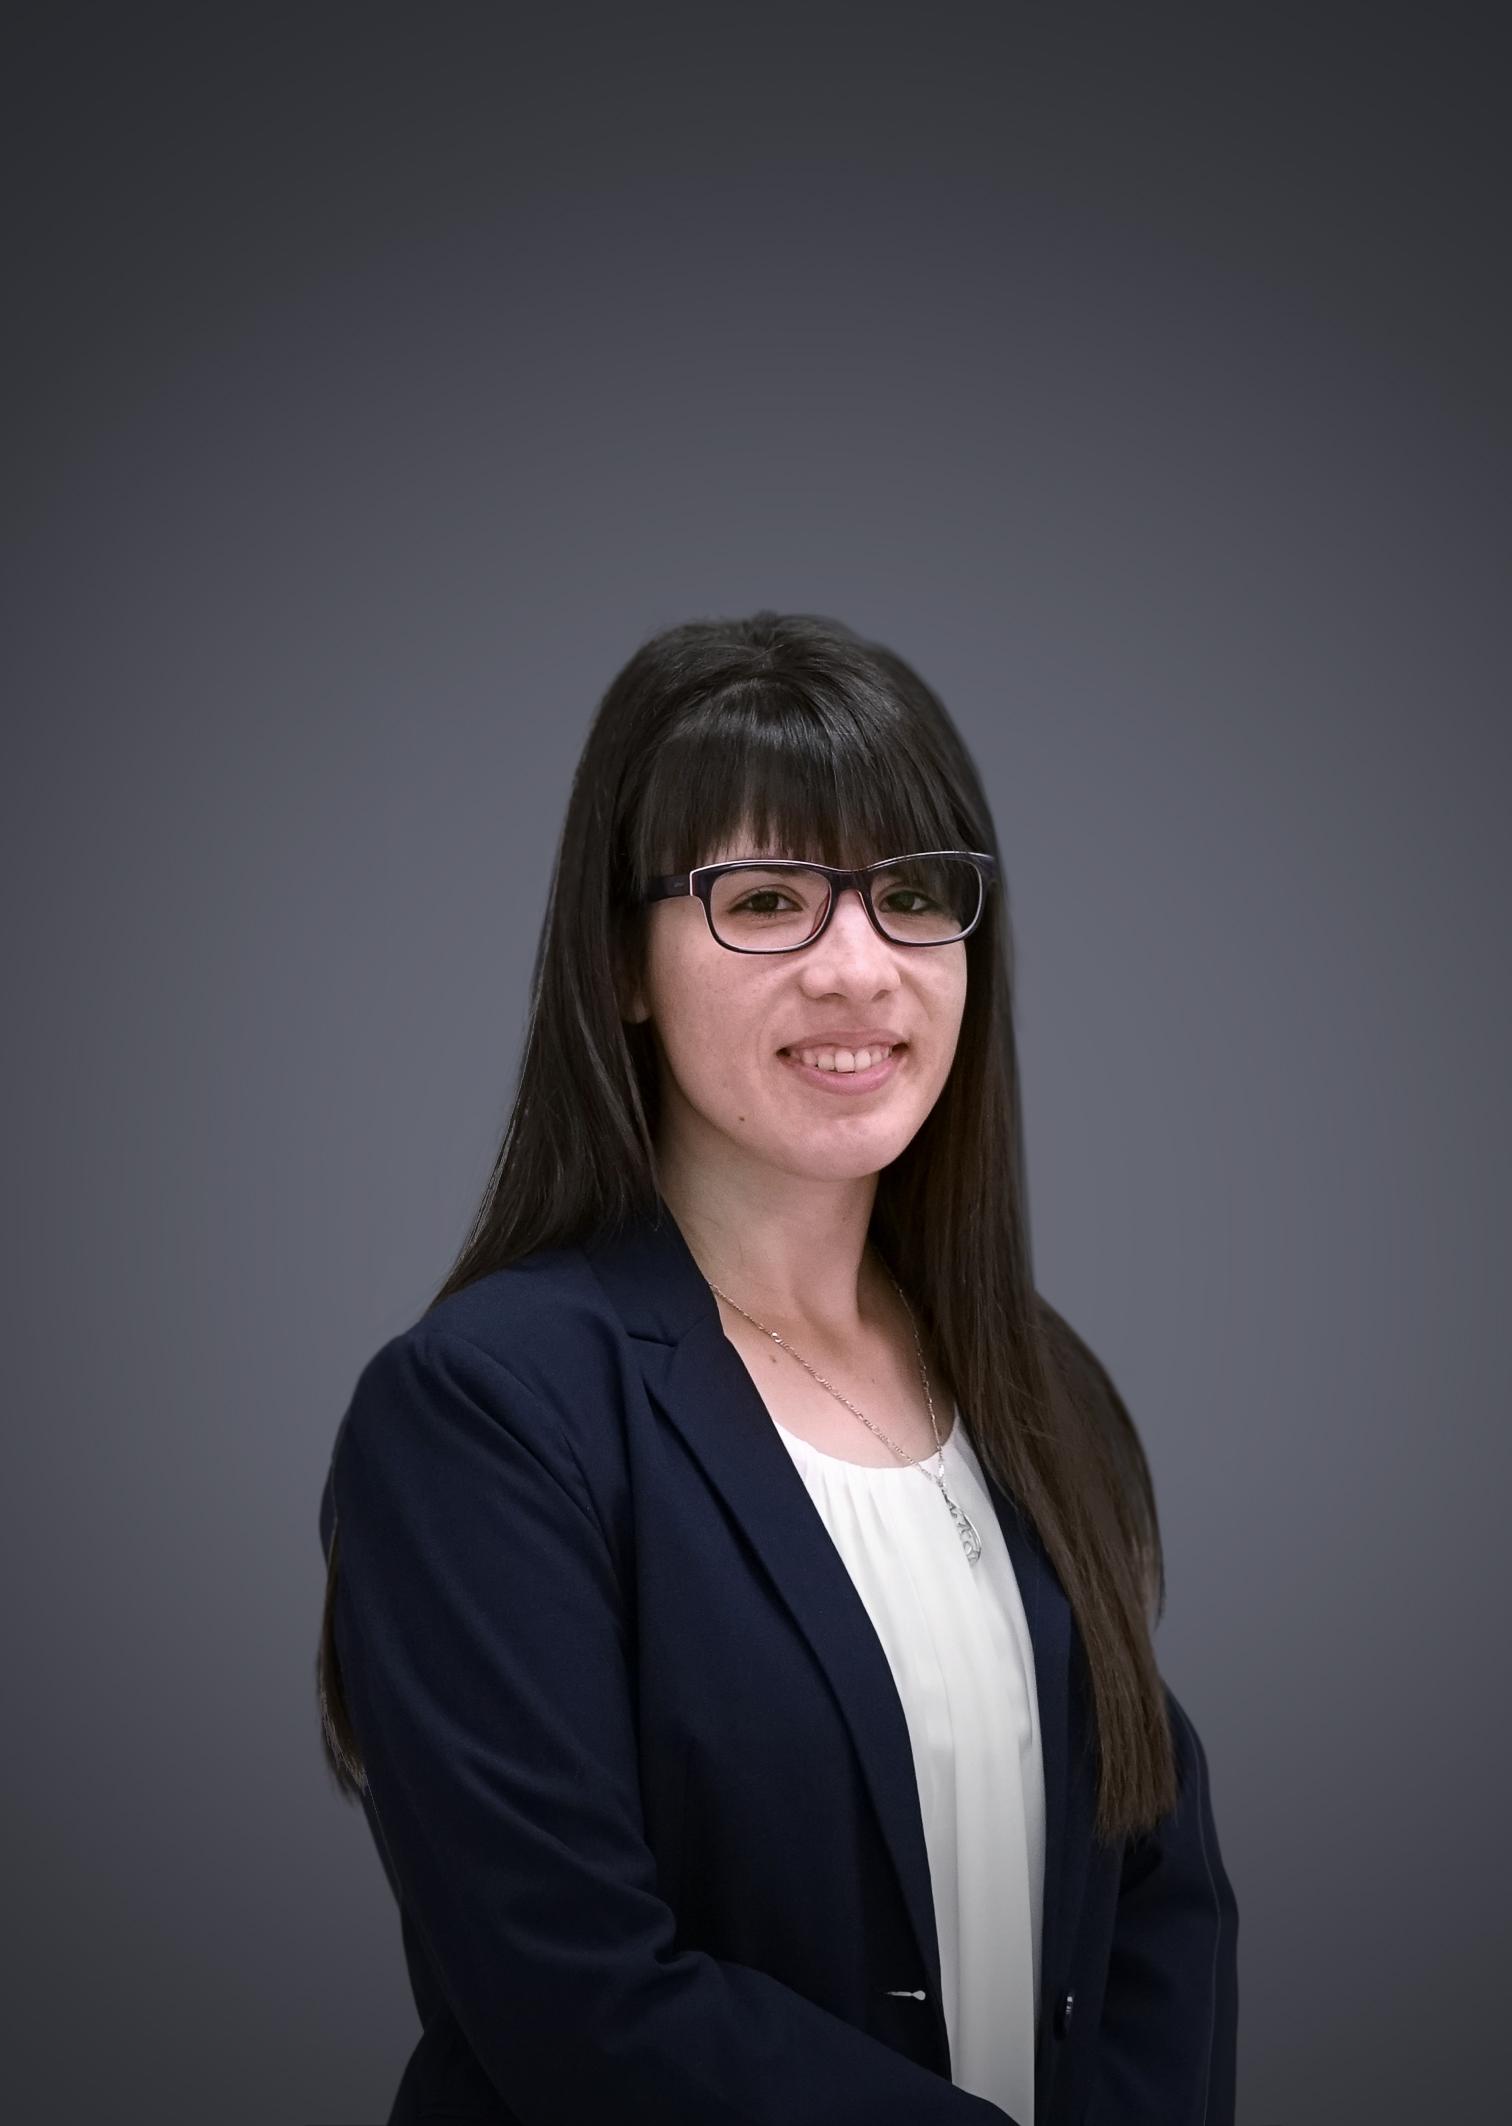 Ana Asensi Faubel